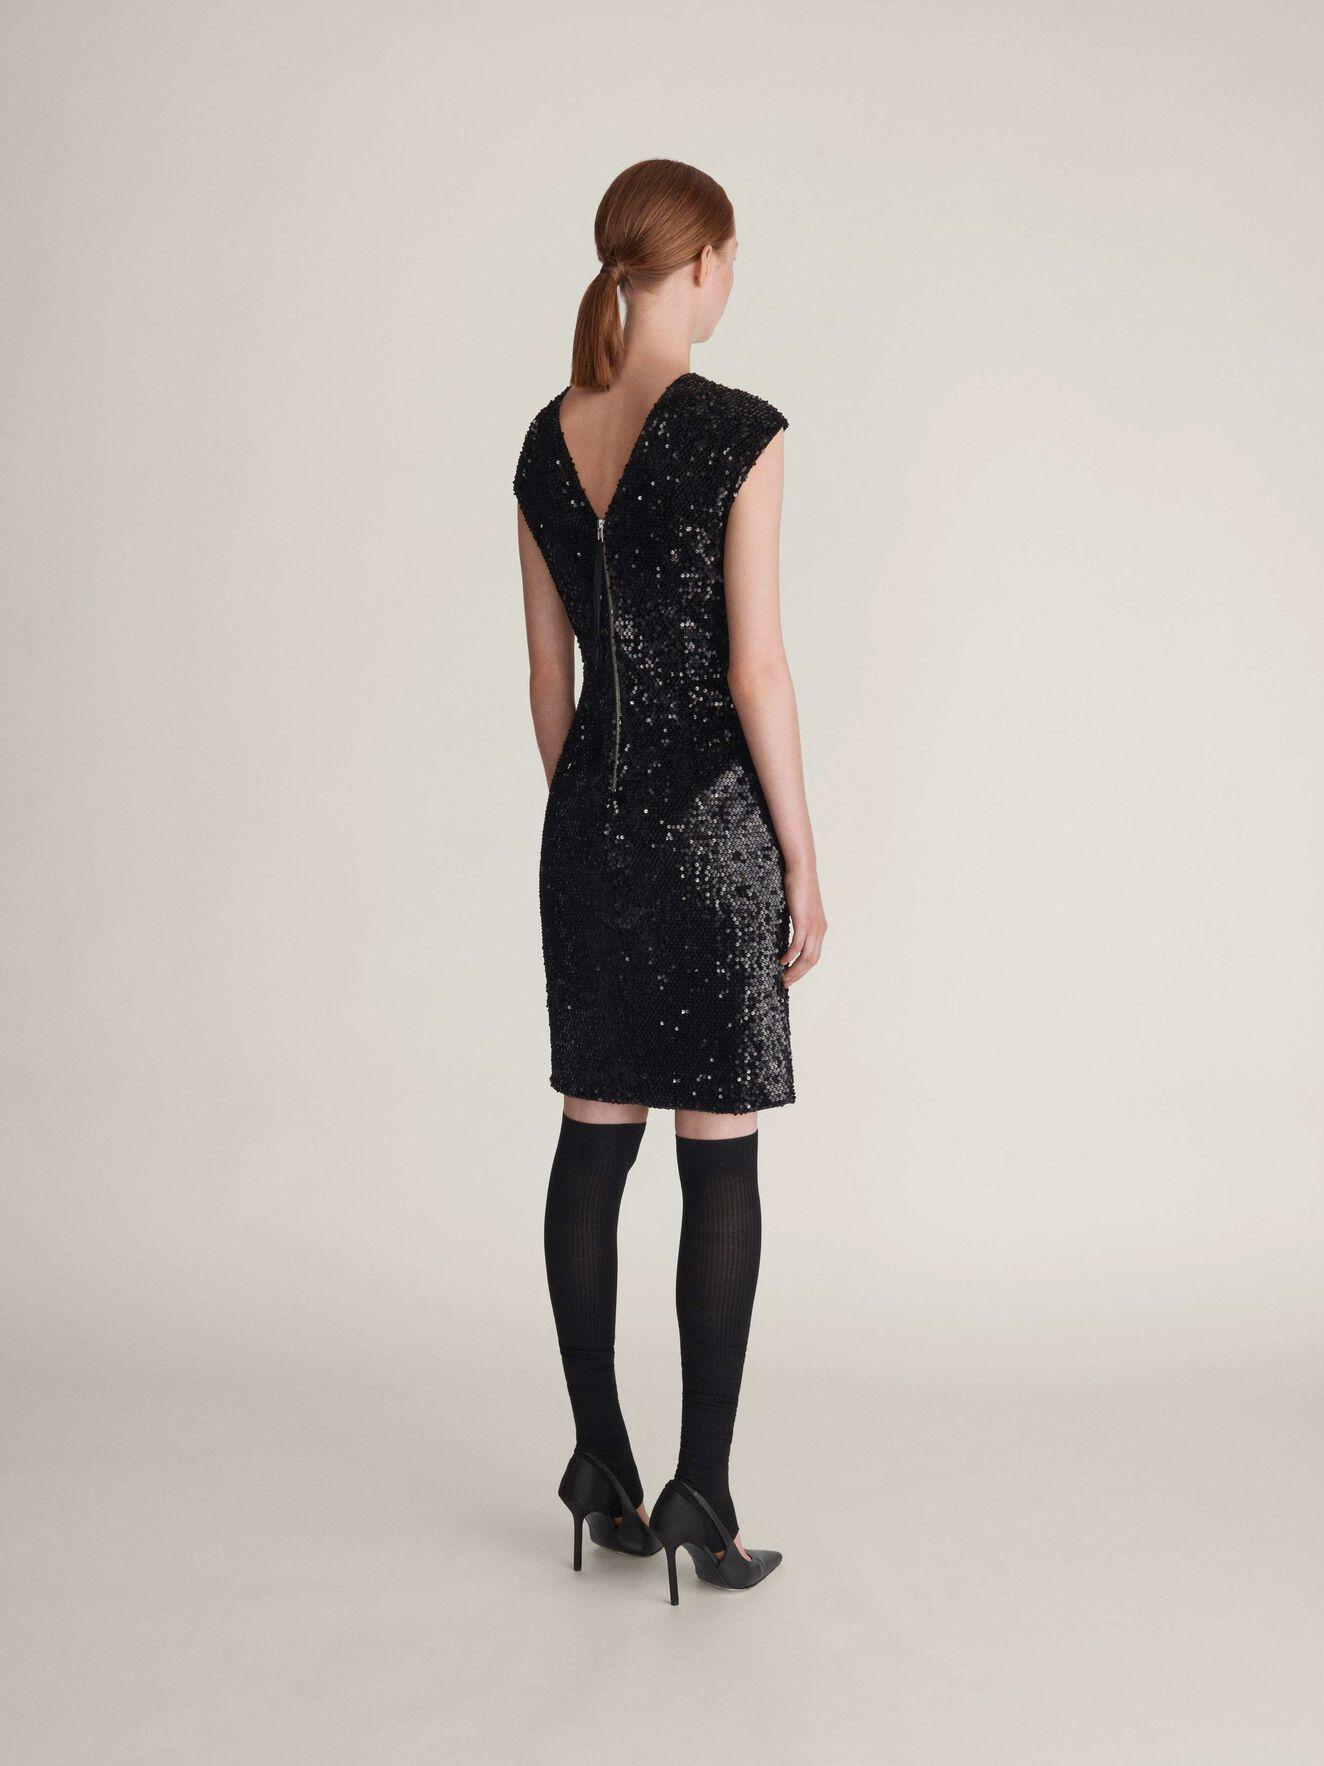 Azha Dress in Midnight Black from Tiger of Sweden